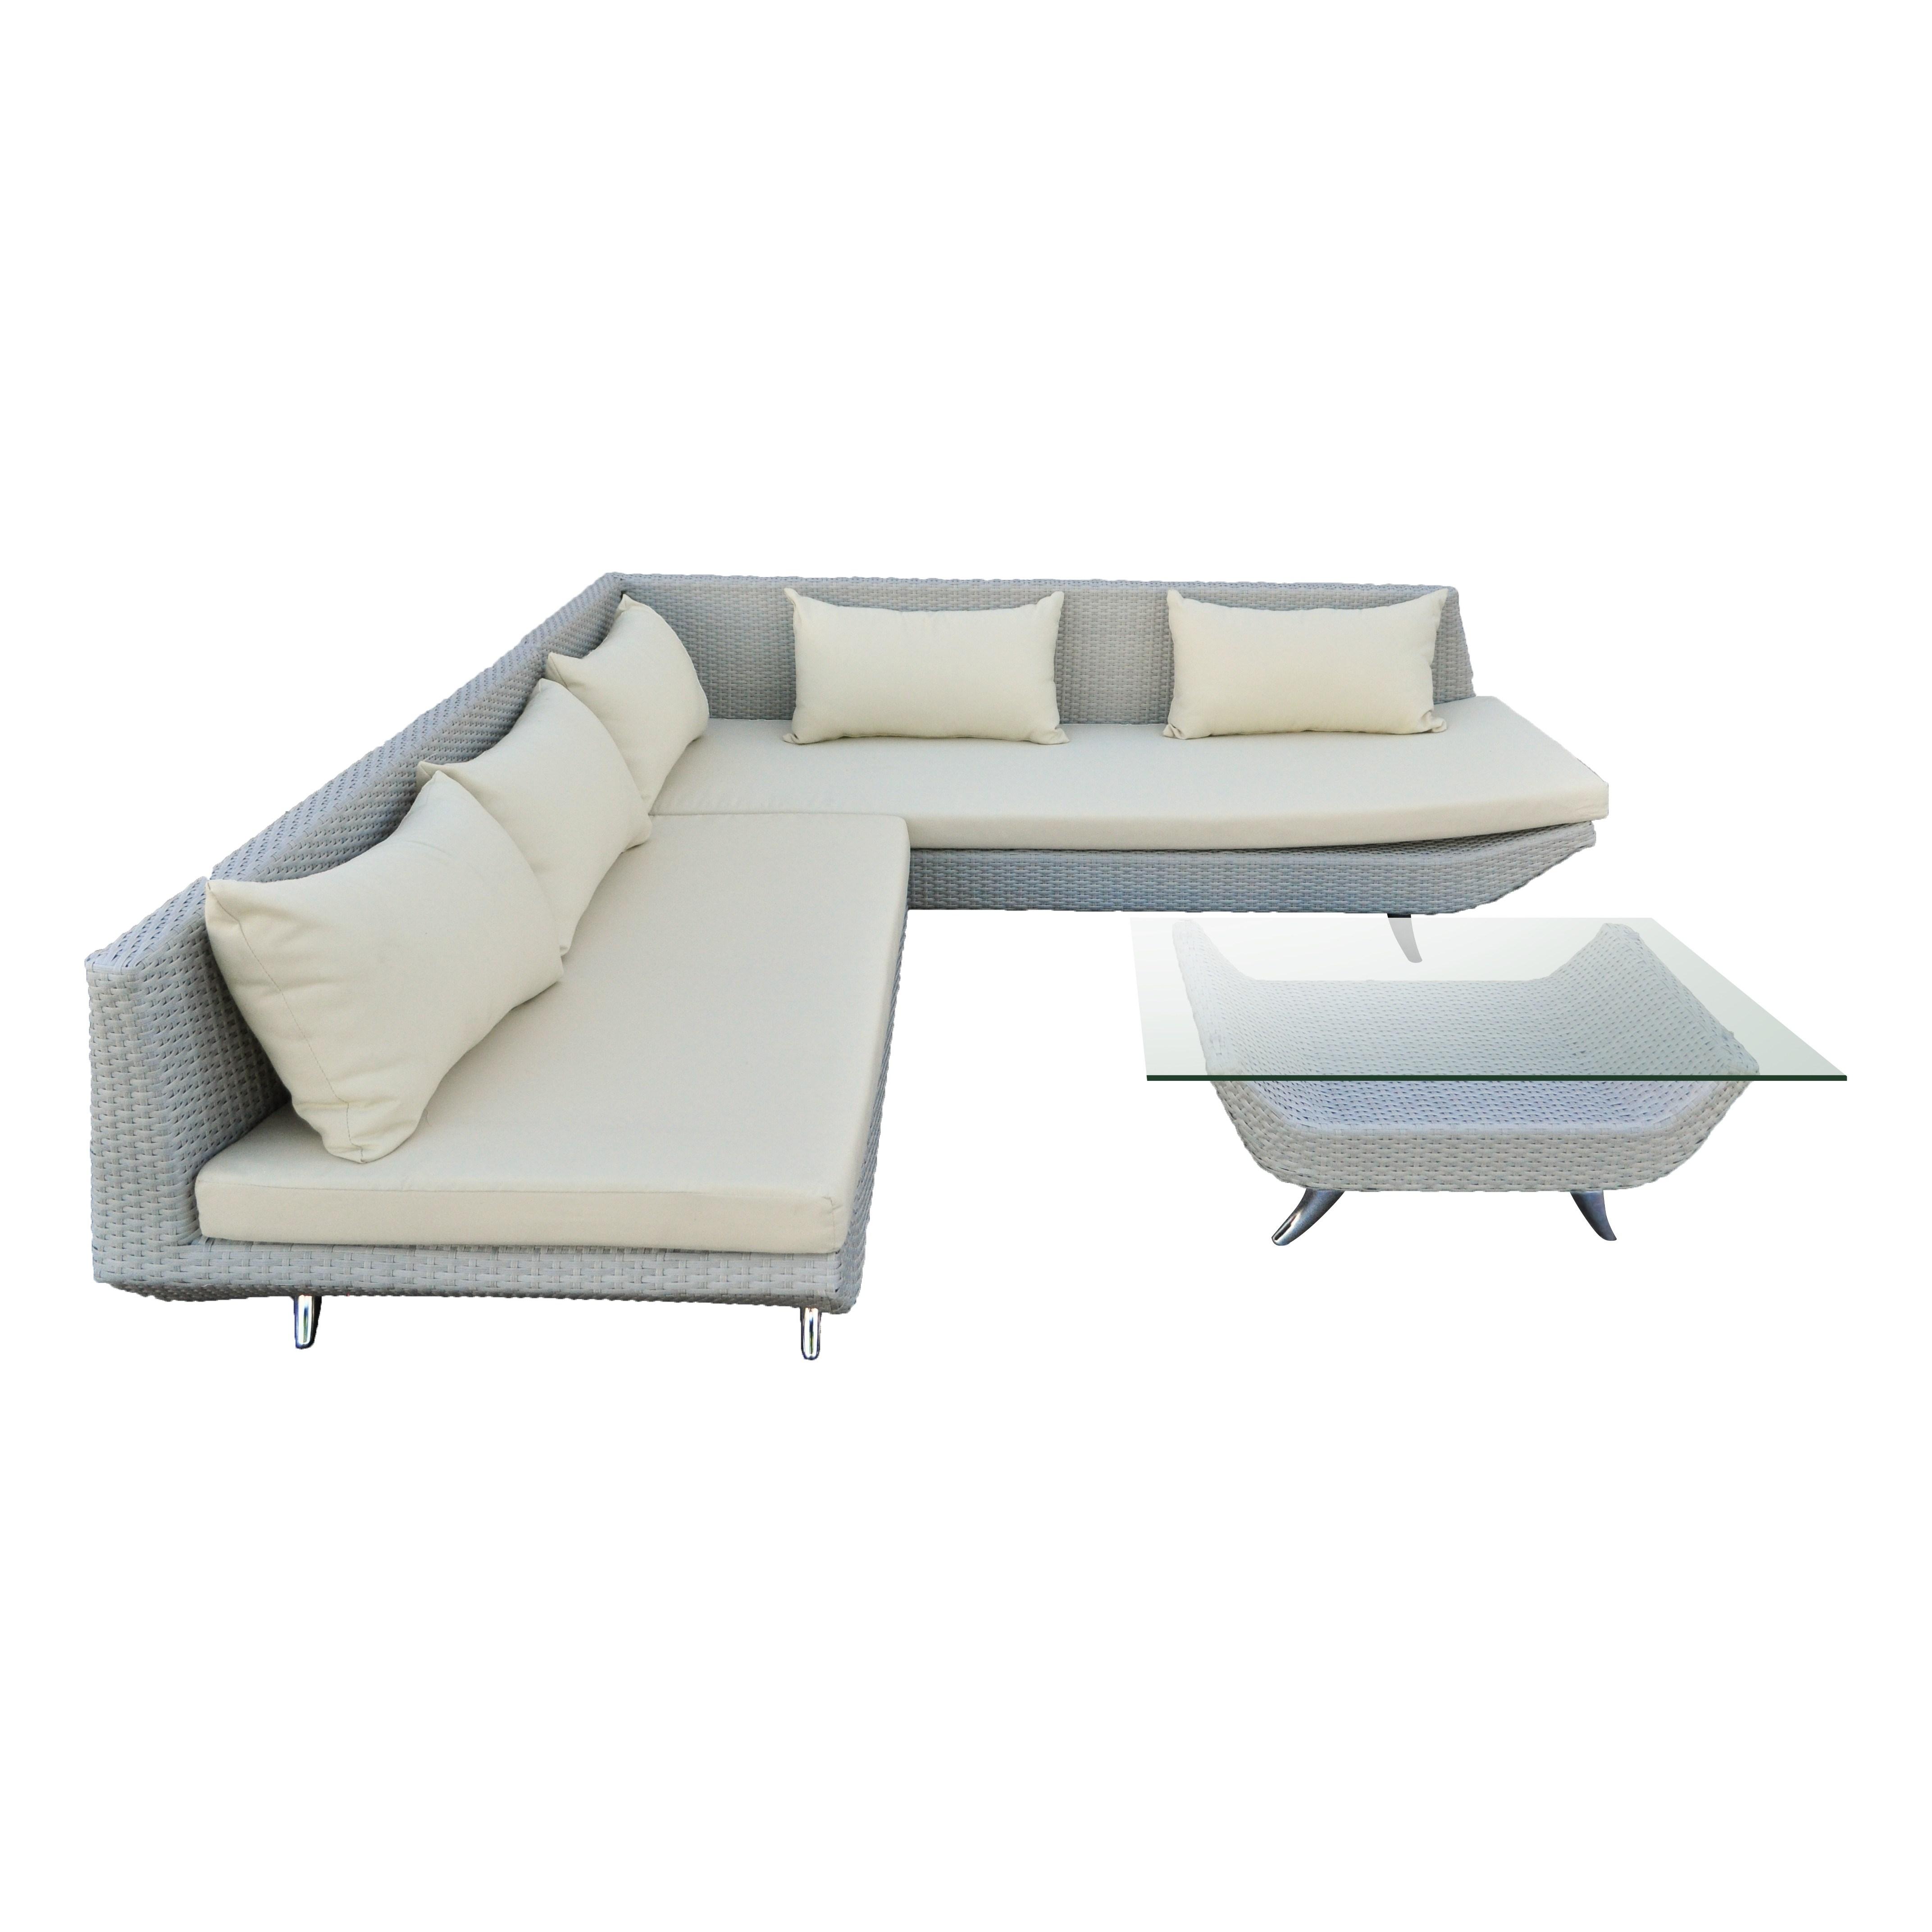 Furniture & Sofa: Ebel Patio Furniture (View 8 of 15)